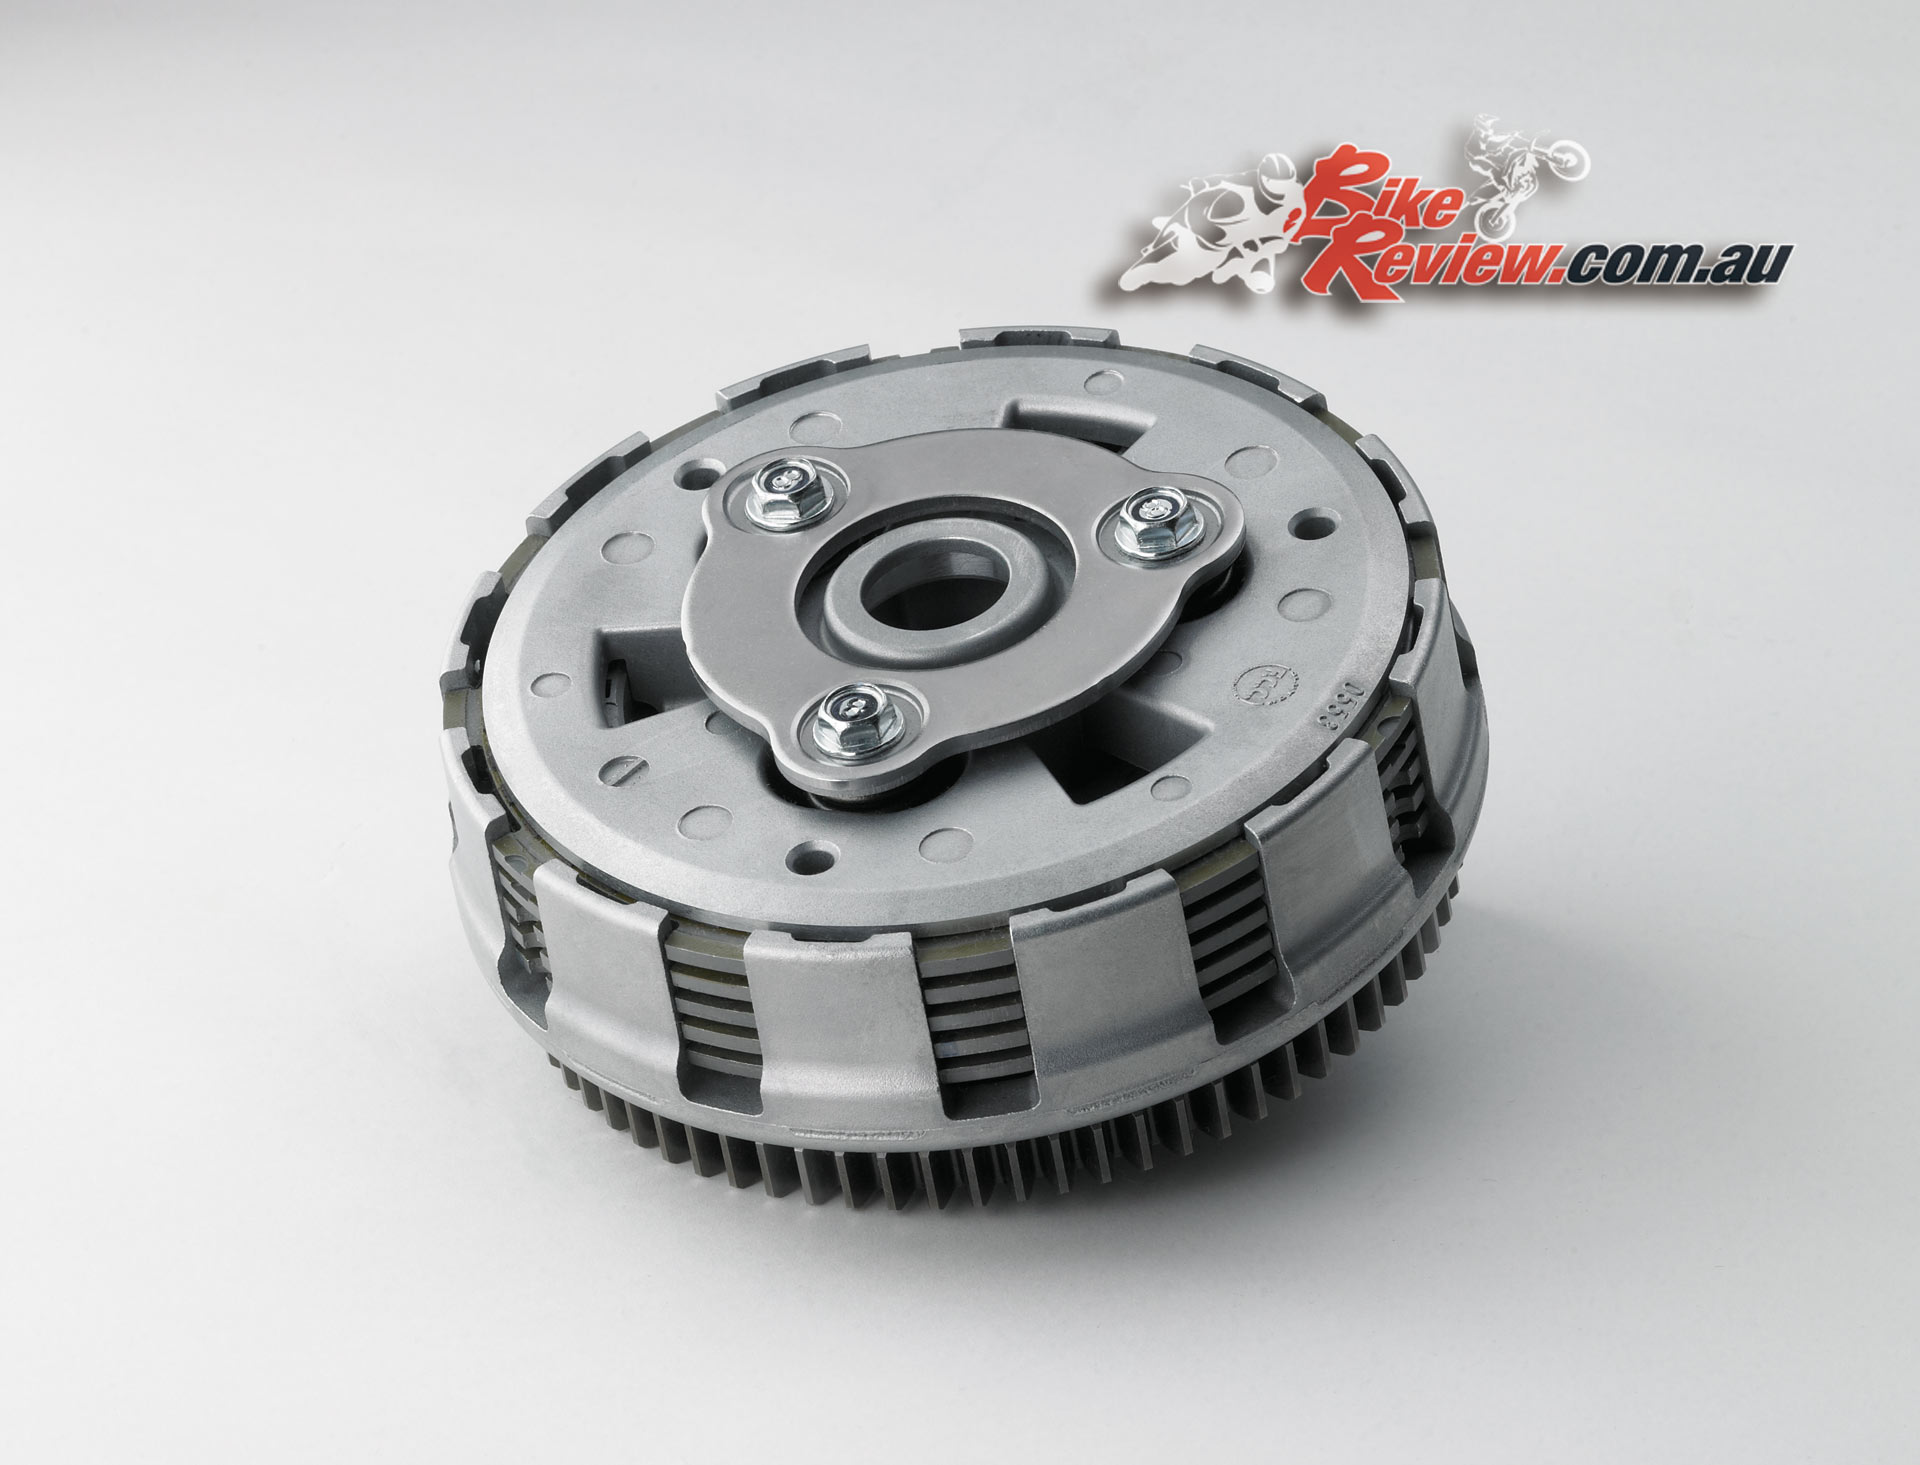 2017 Kawasaki Versys-X 300, clutch